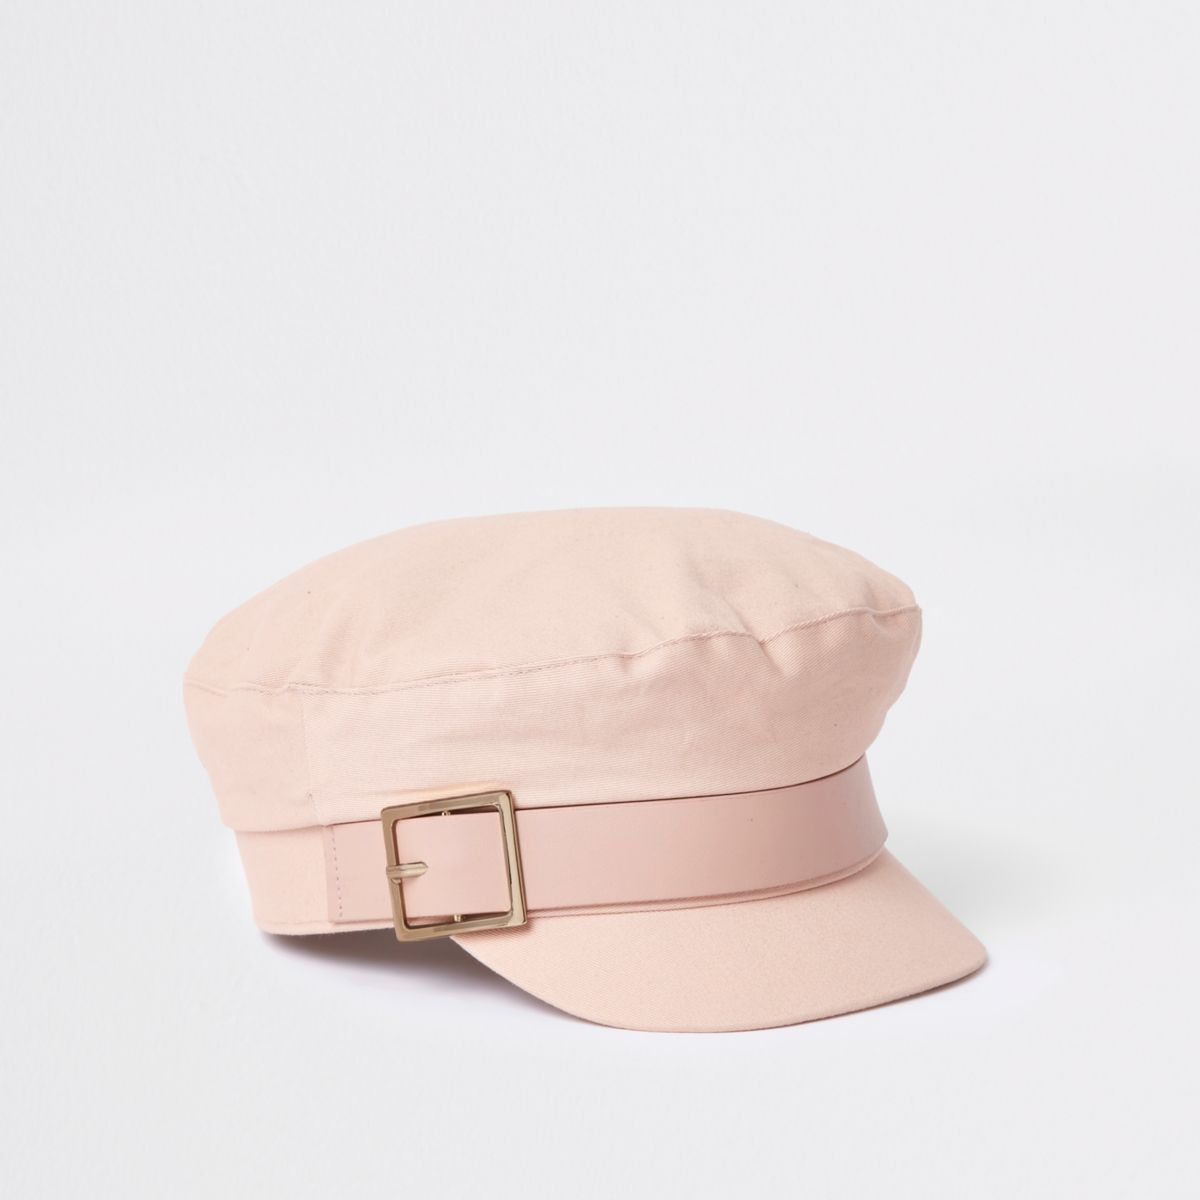 Nude pink buckle baker boy hat